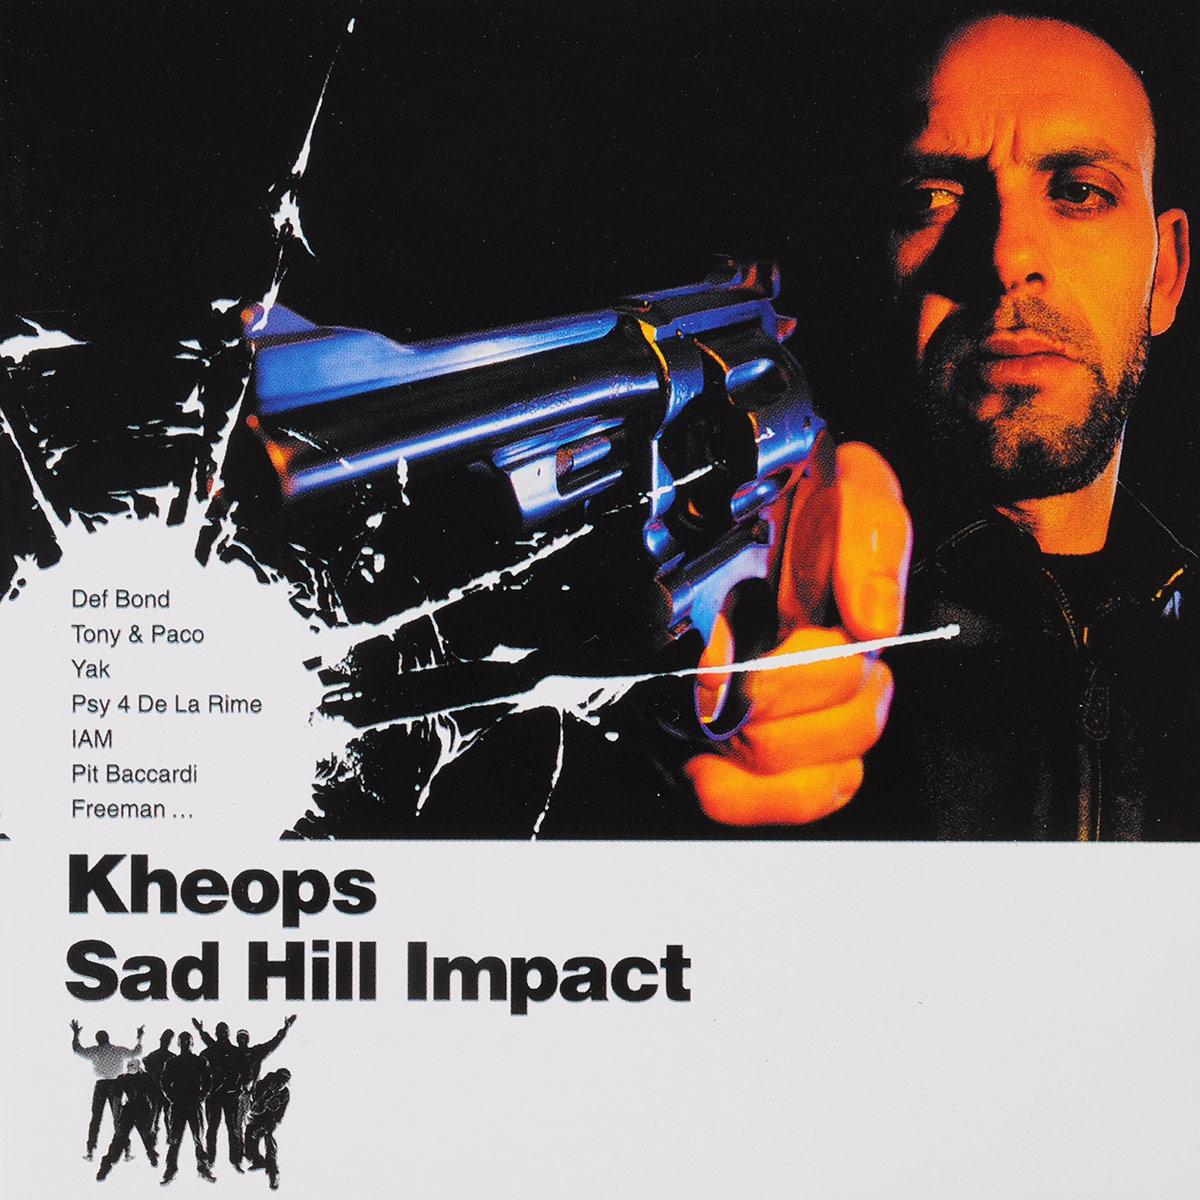 VARIOUS ARTISTS. KHEOPS - SAD HILL IMPACT